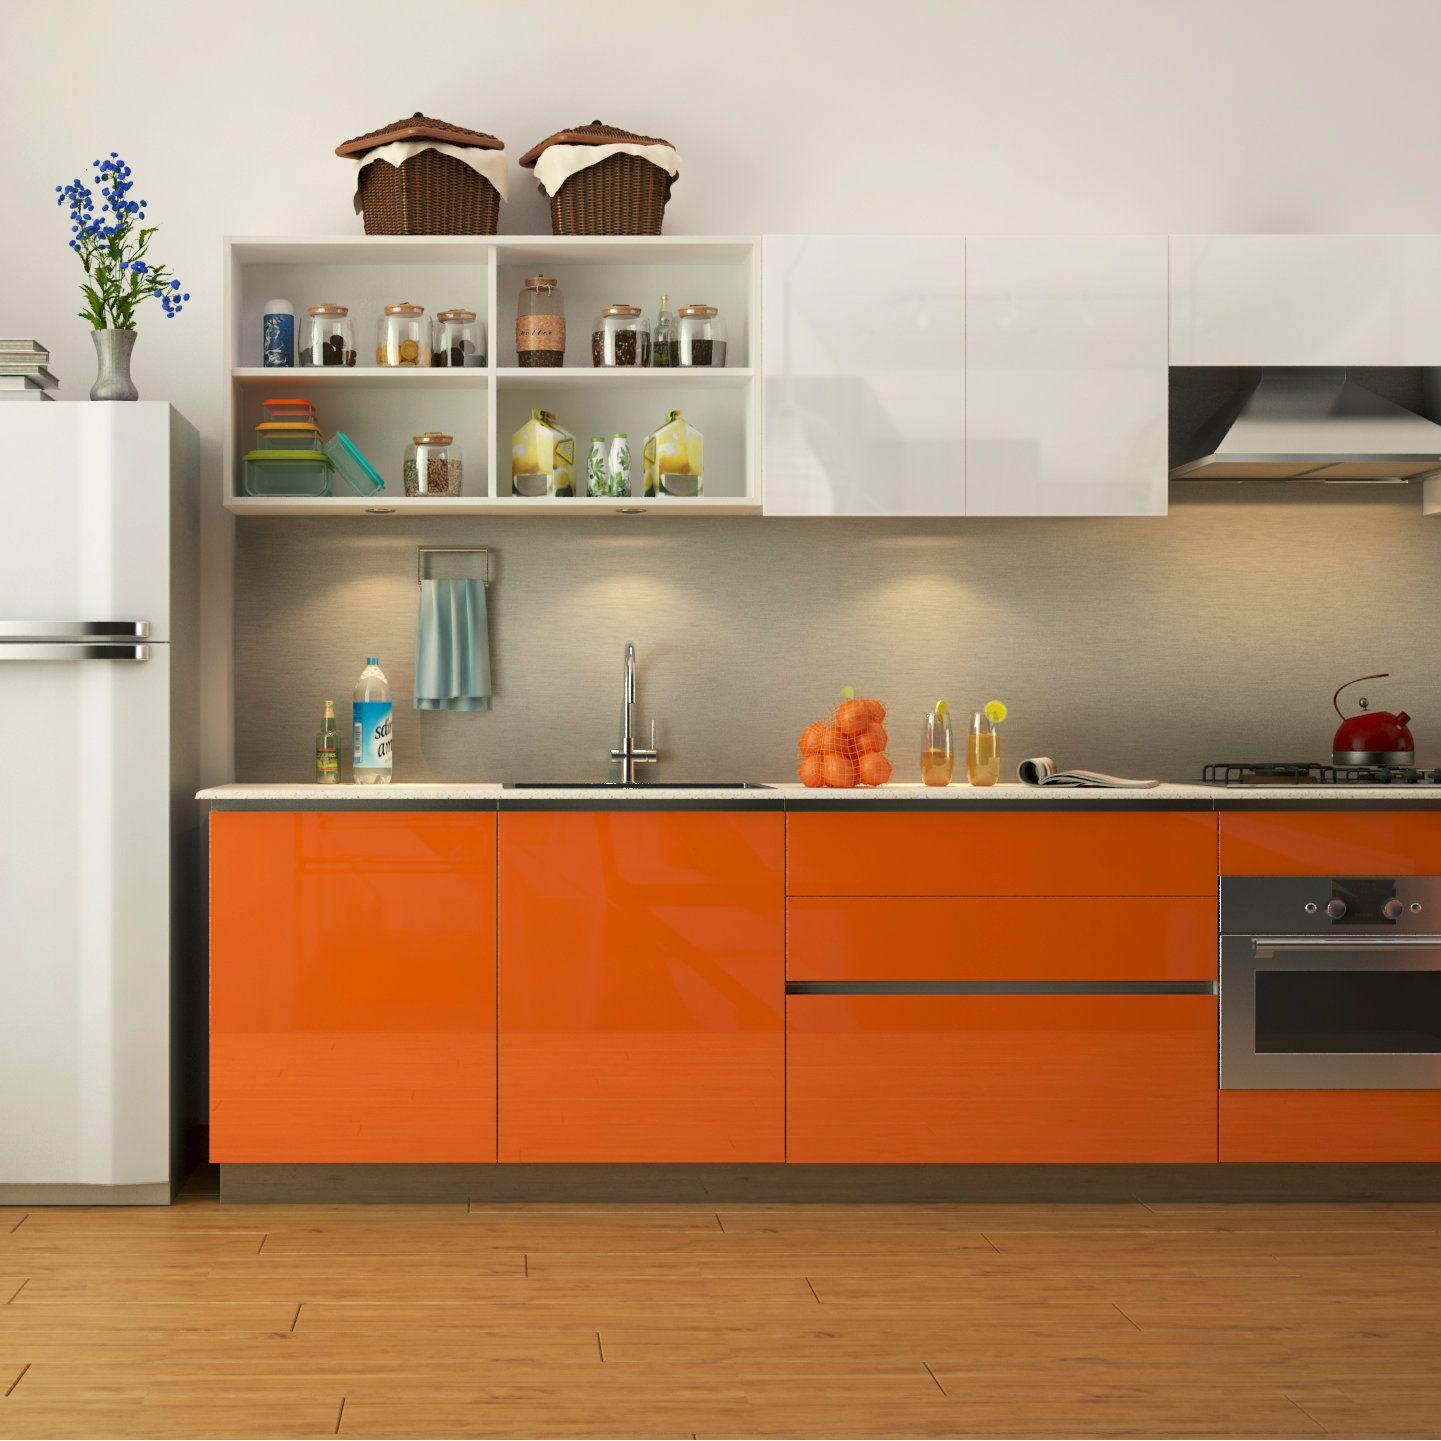 Straight Modular Kitchen That S Crisp And Charismatic Modern Kitchen Cabinets Kitchen Cabinets Kitchen Design